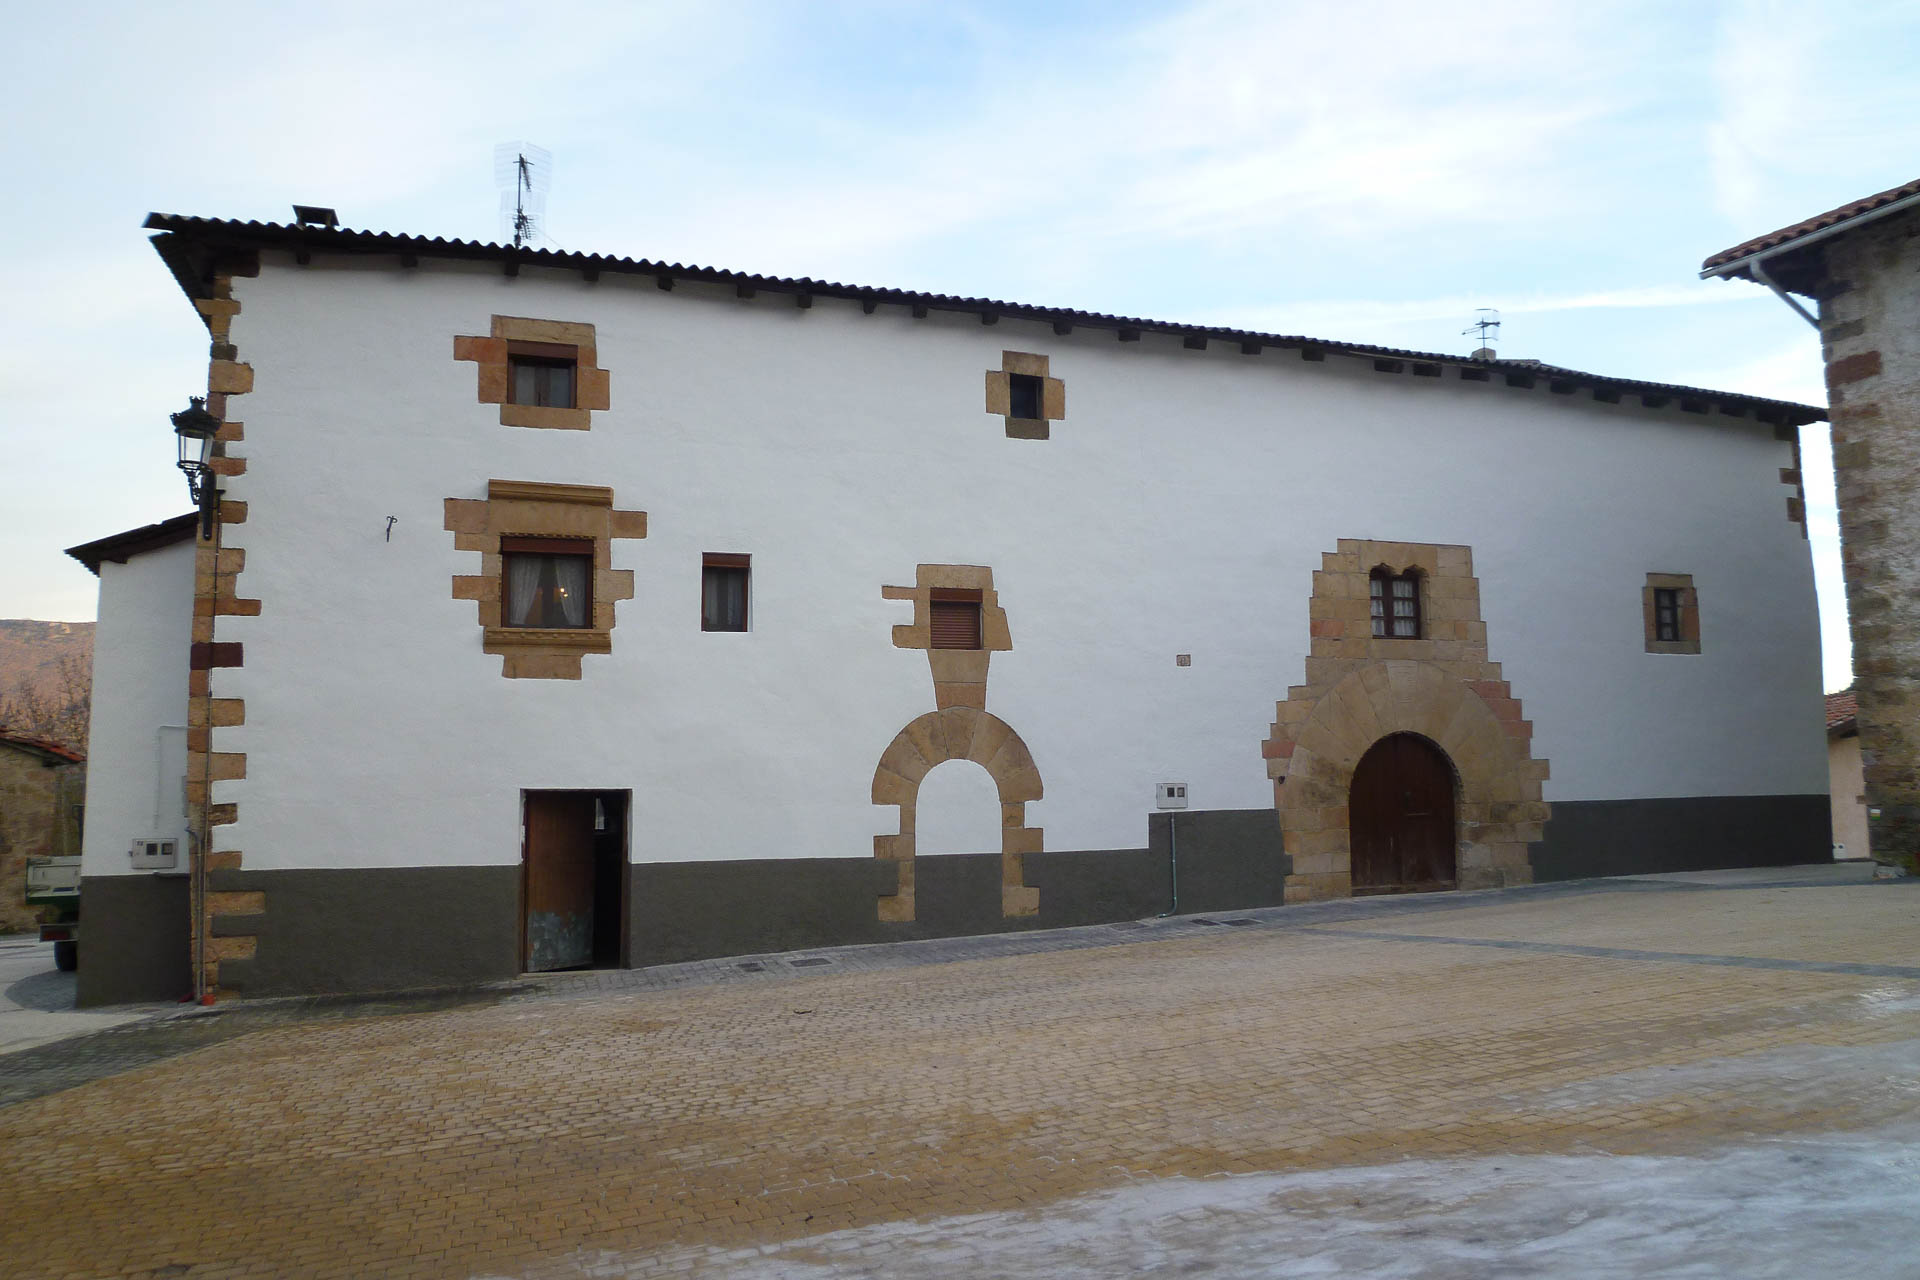 Pintura de Fachada en Saragüeta